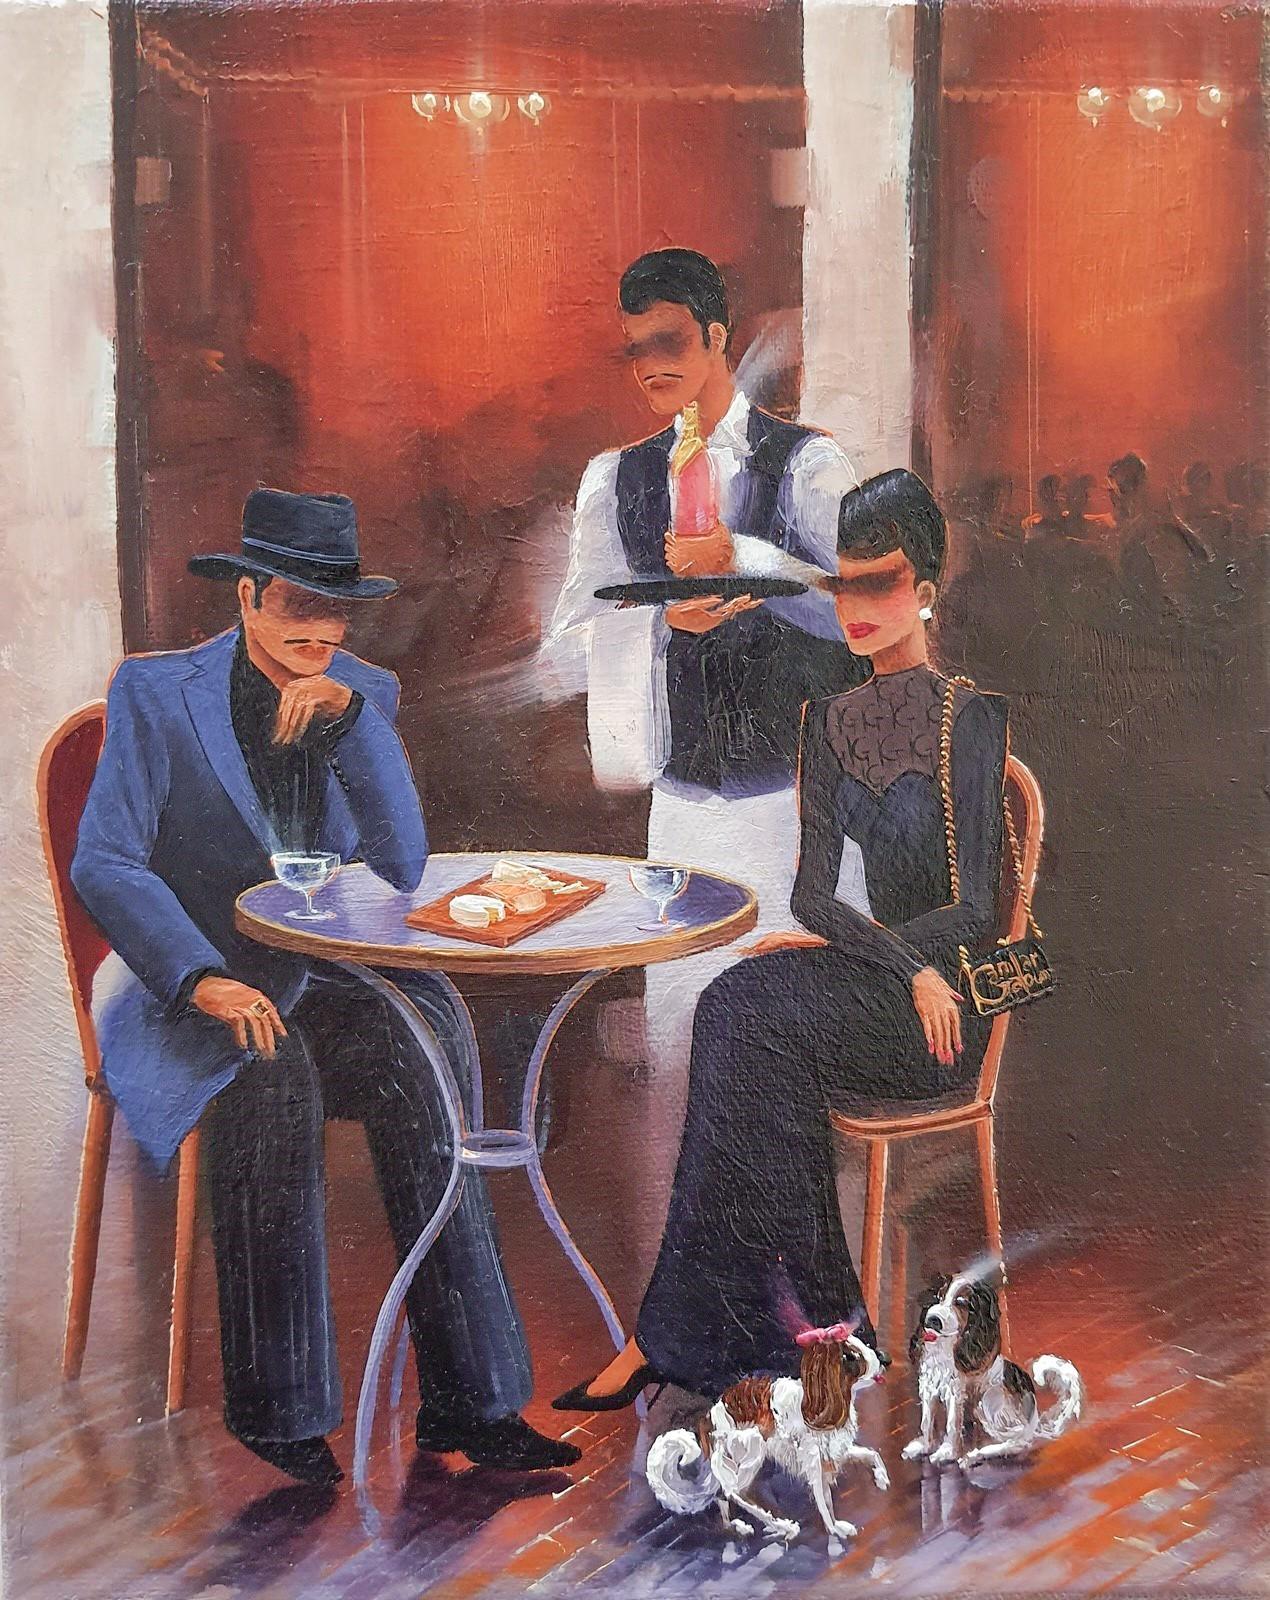 Kamiar Gajoum Parisian Cafe Original Oil Painting 10x8